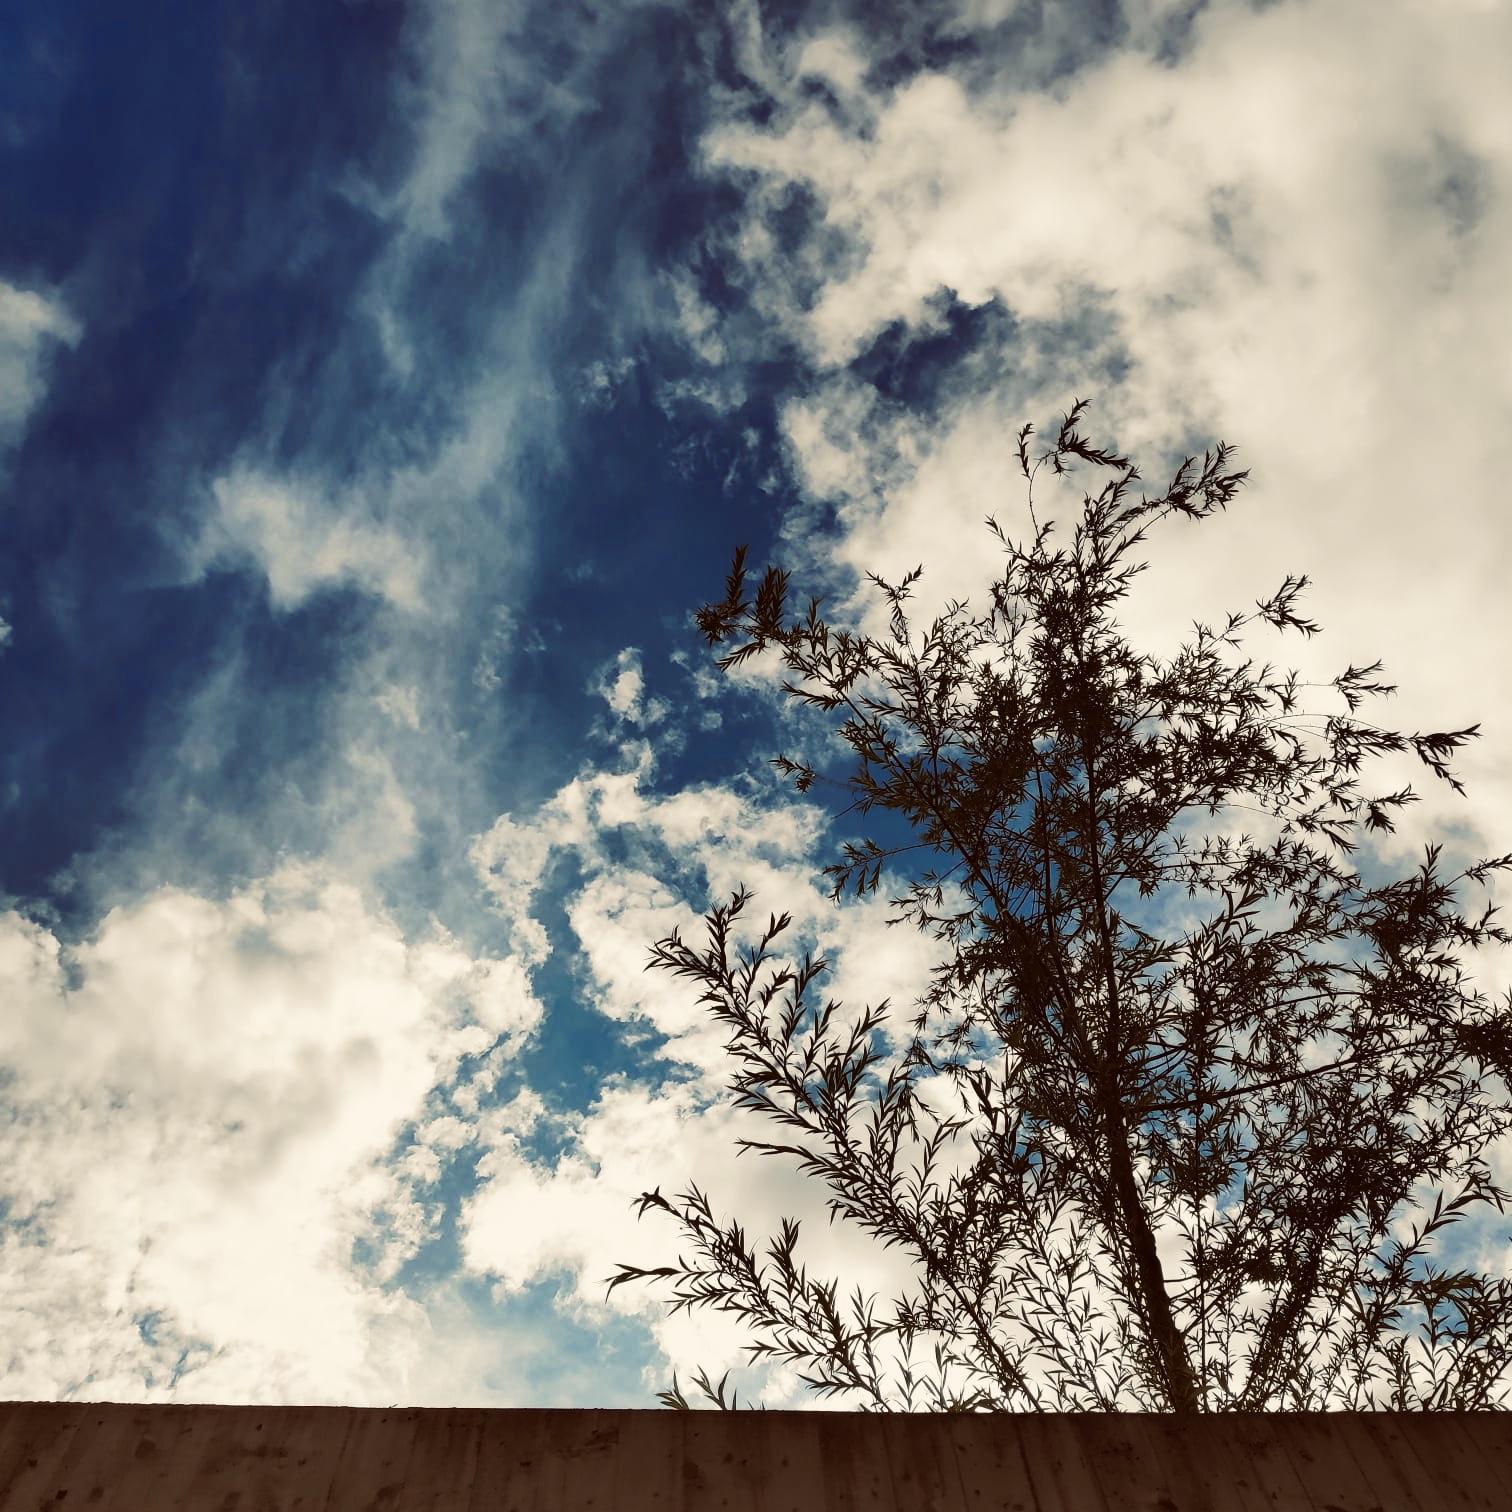 Tree.Wall.Sky.Done. Photography.